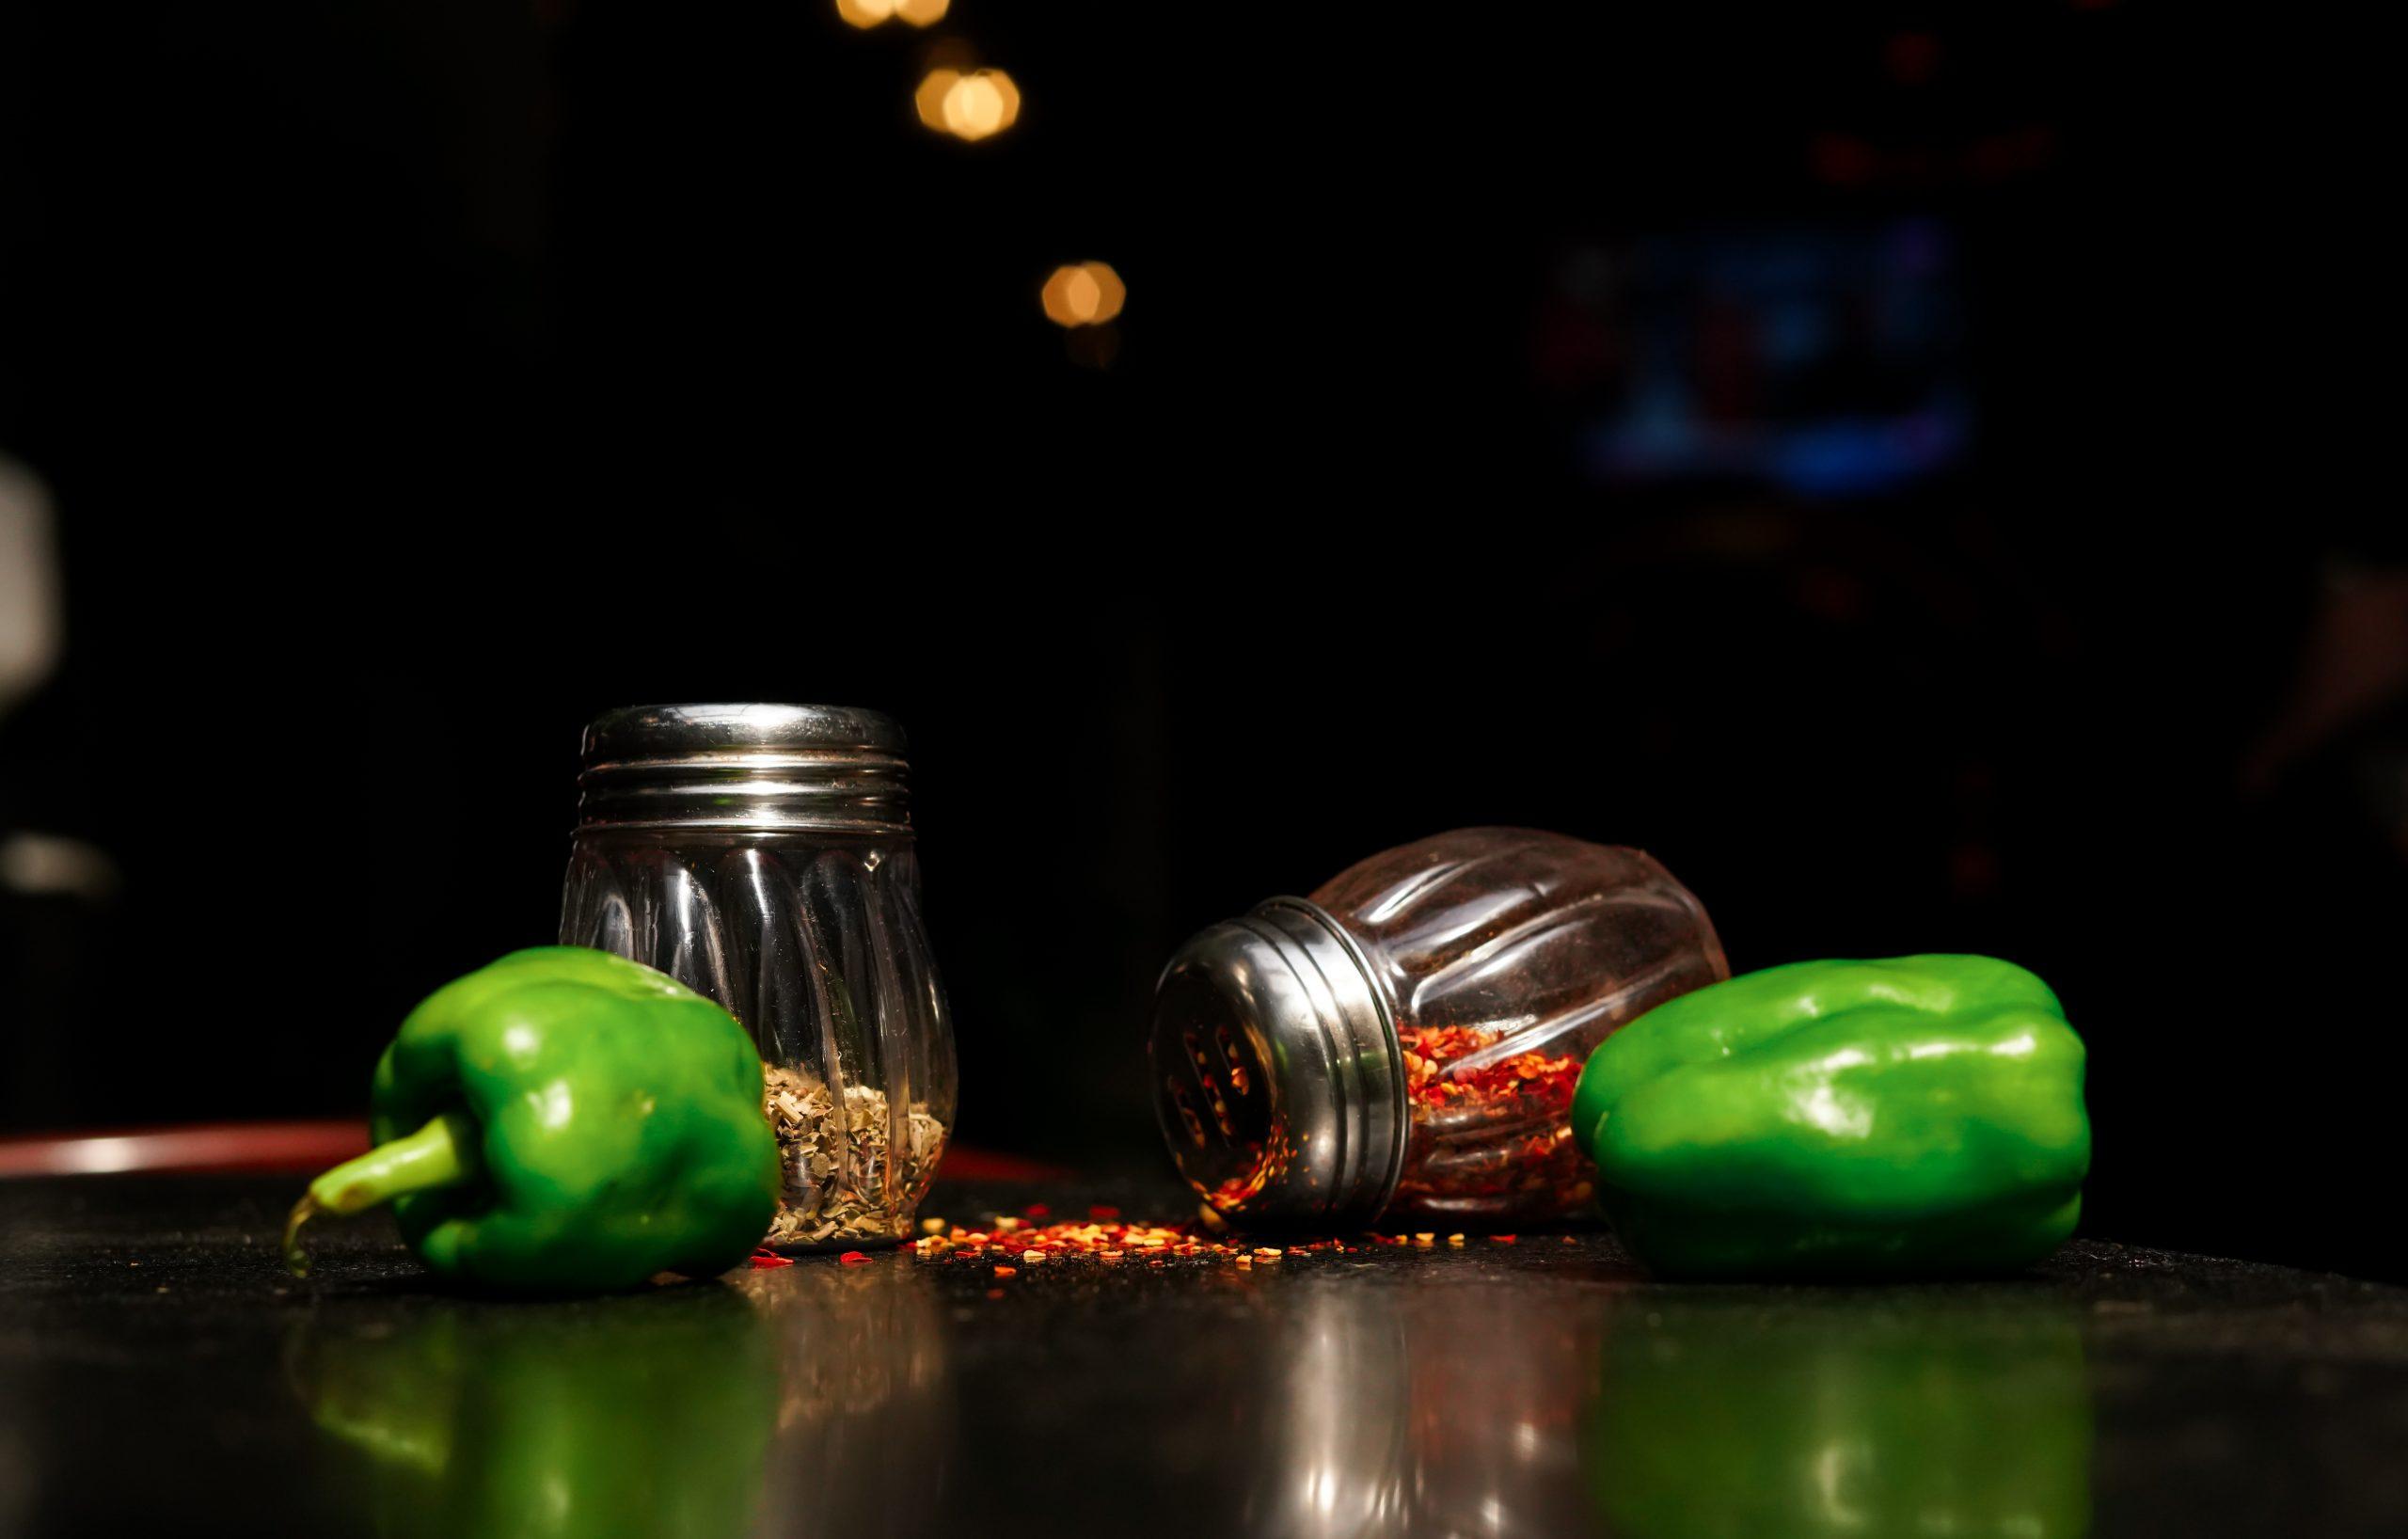 capsicum and seasonings